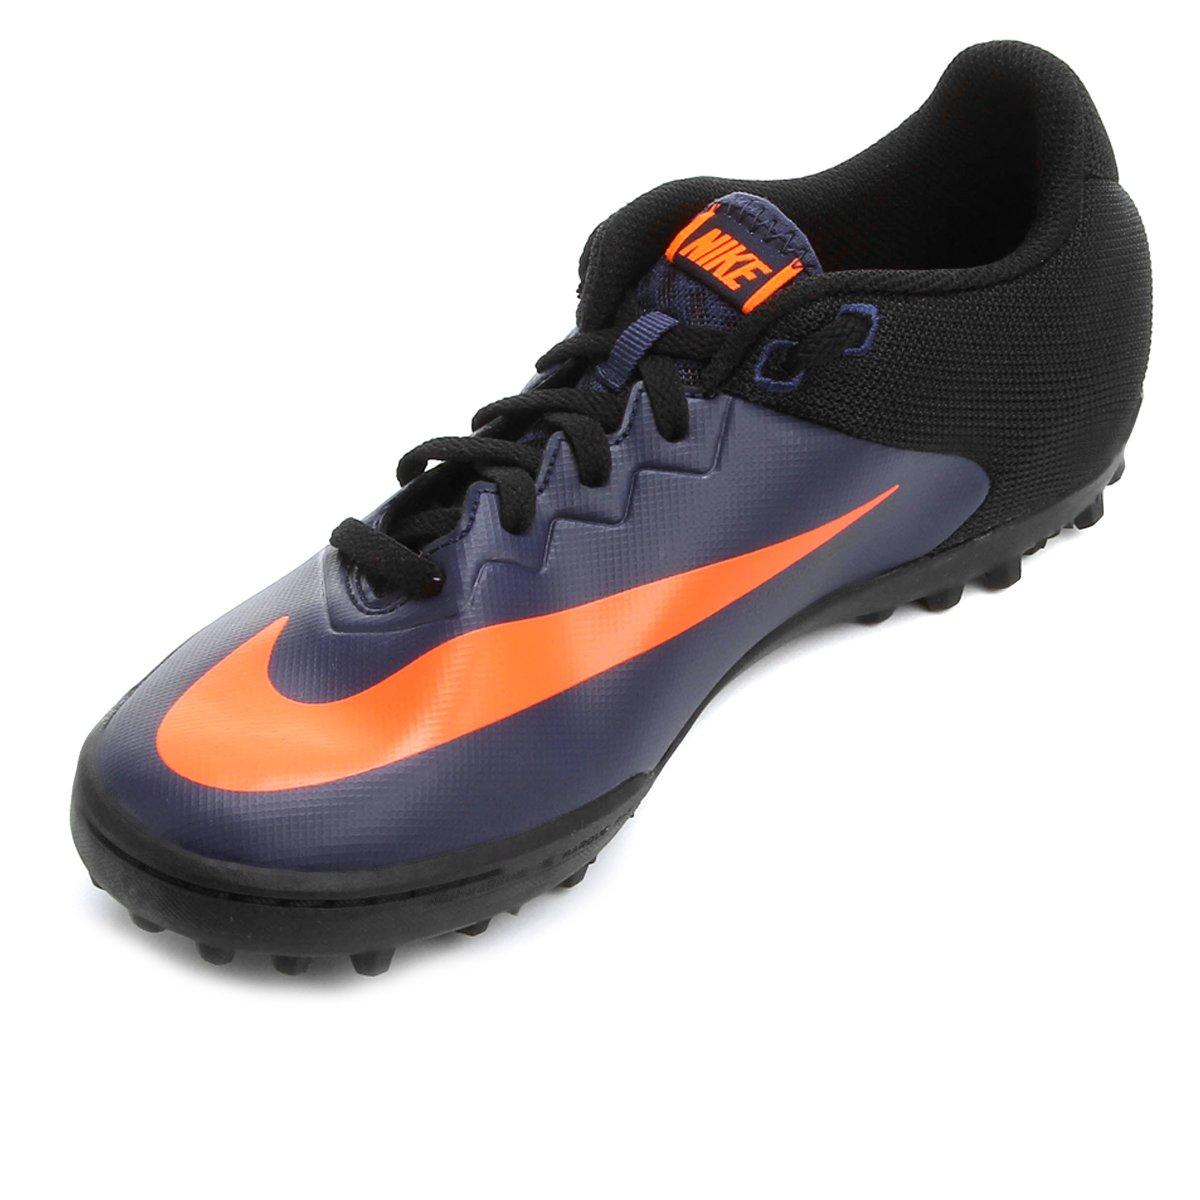 6e4b250497 Chuteira Society Nike Hypervenom Pro TF - Compre Agora